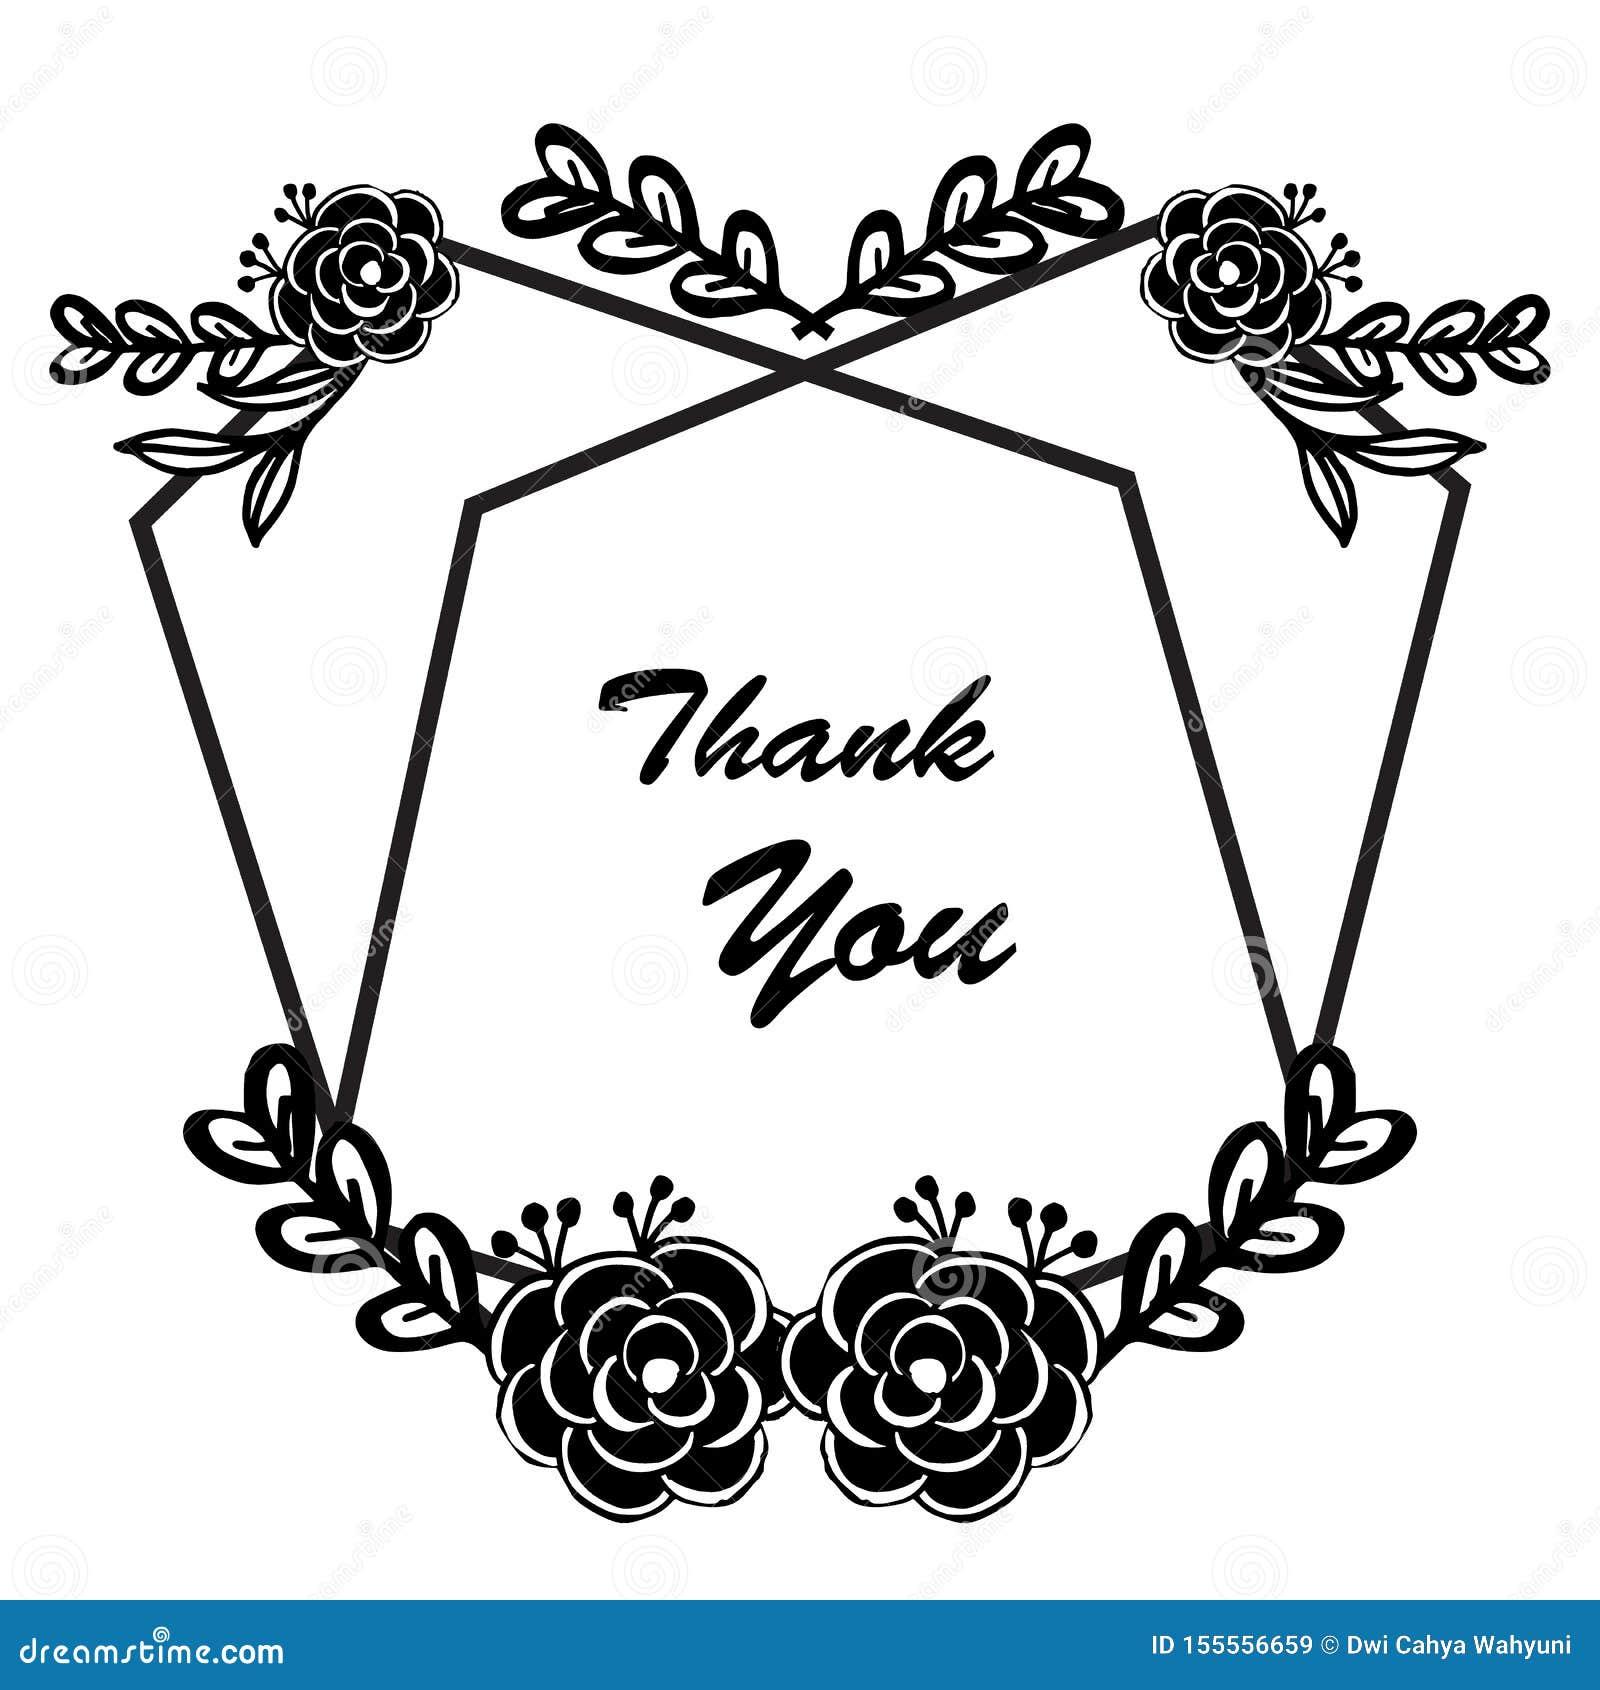 Design Element Floral Frame Background Black White For Card Thank You Vector Stock Vector Illustration Of Drawn Gift 155556659